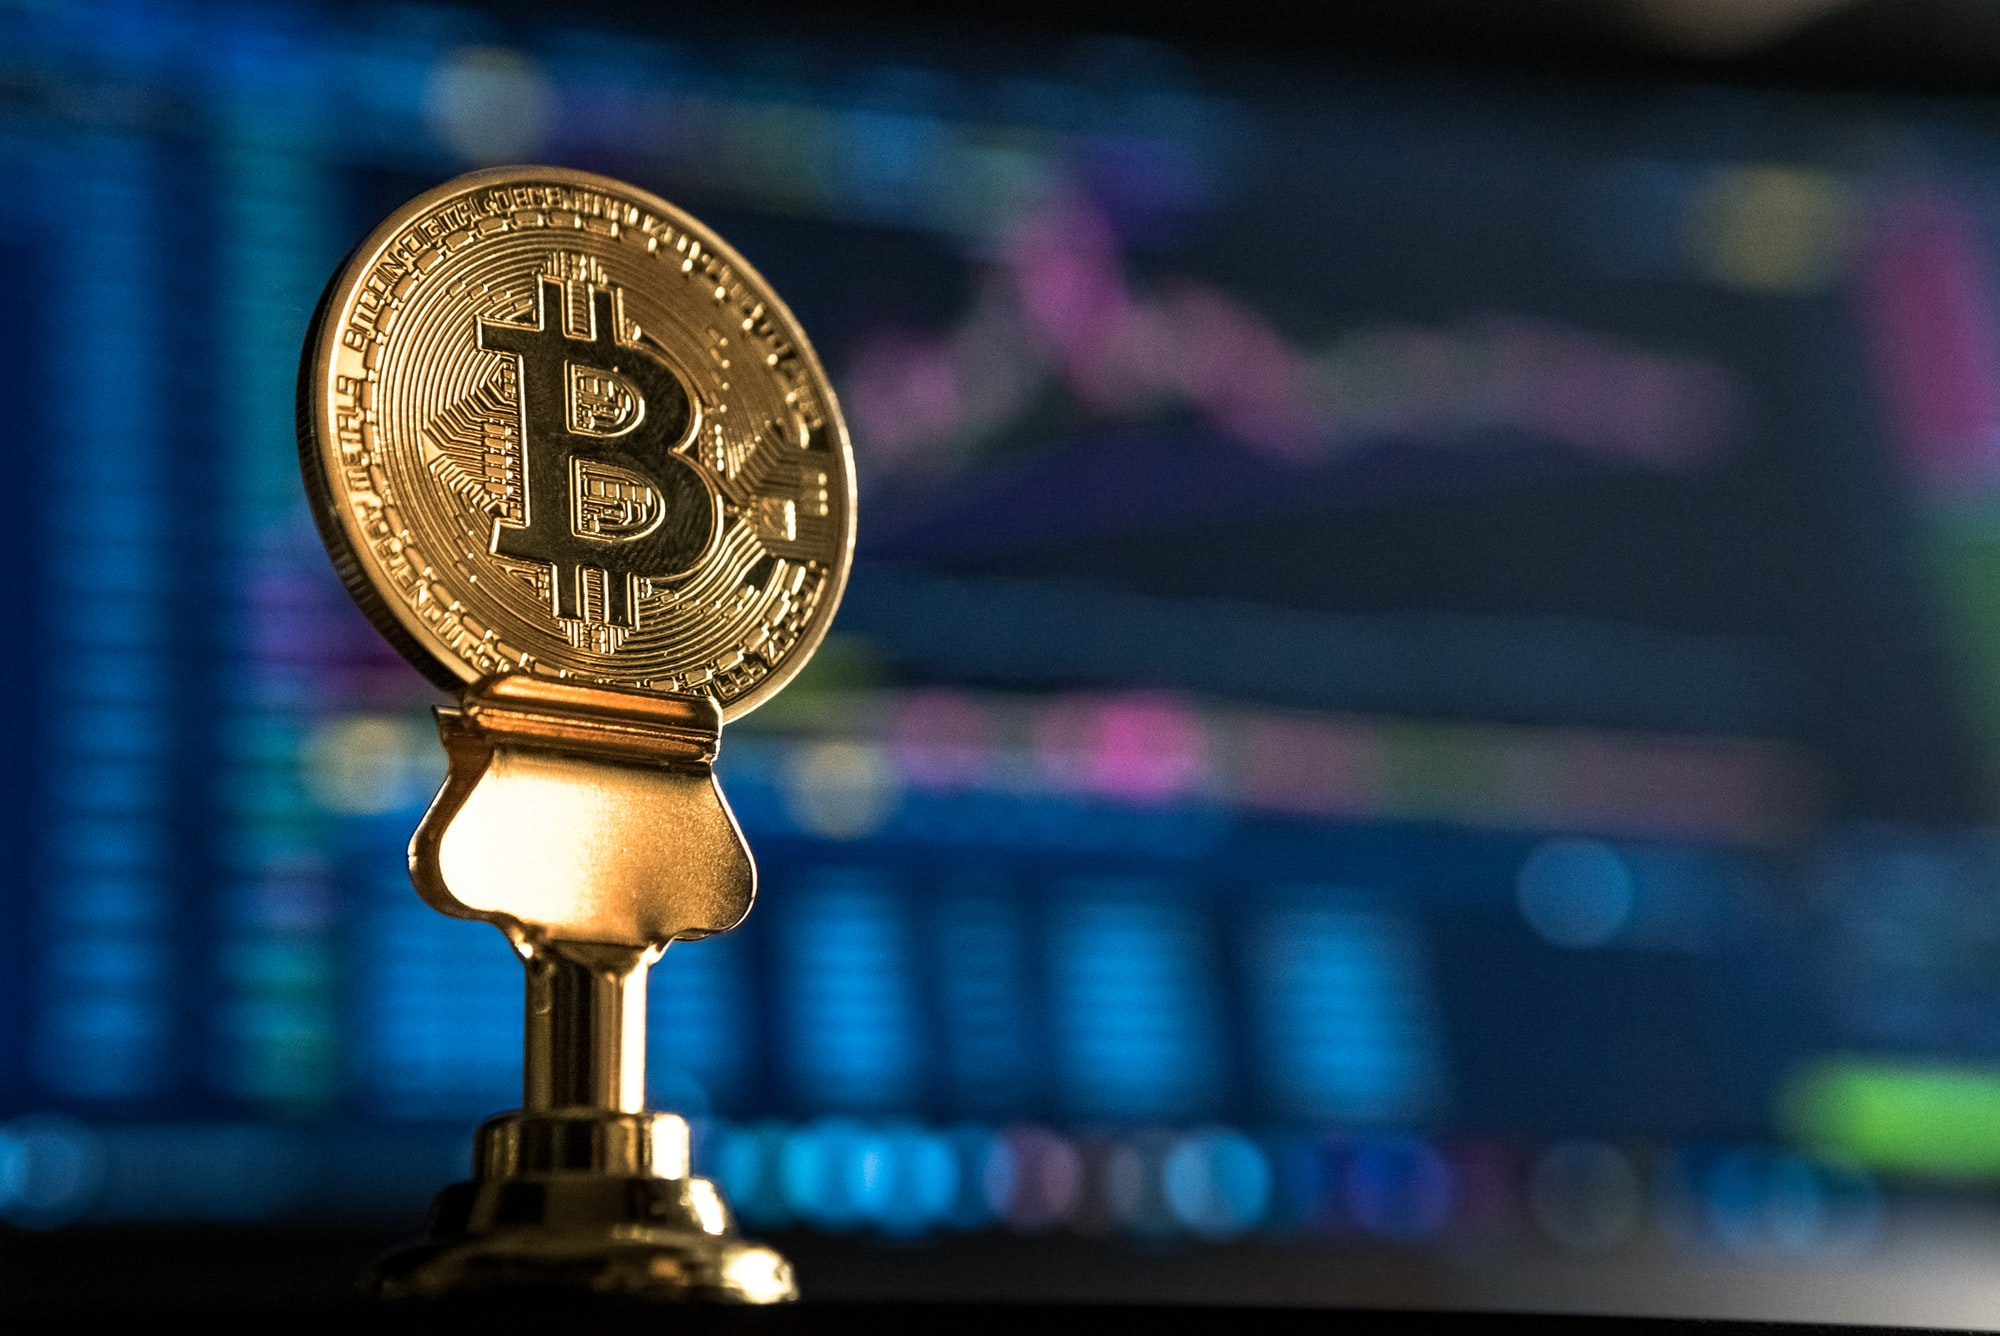 El Salvador's Bitcoin choice